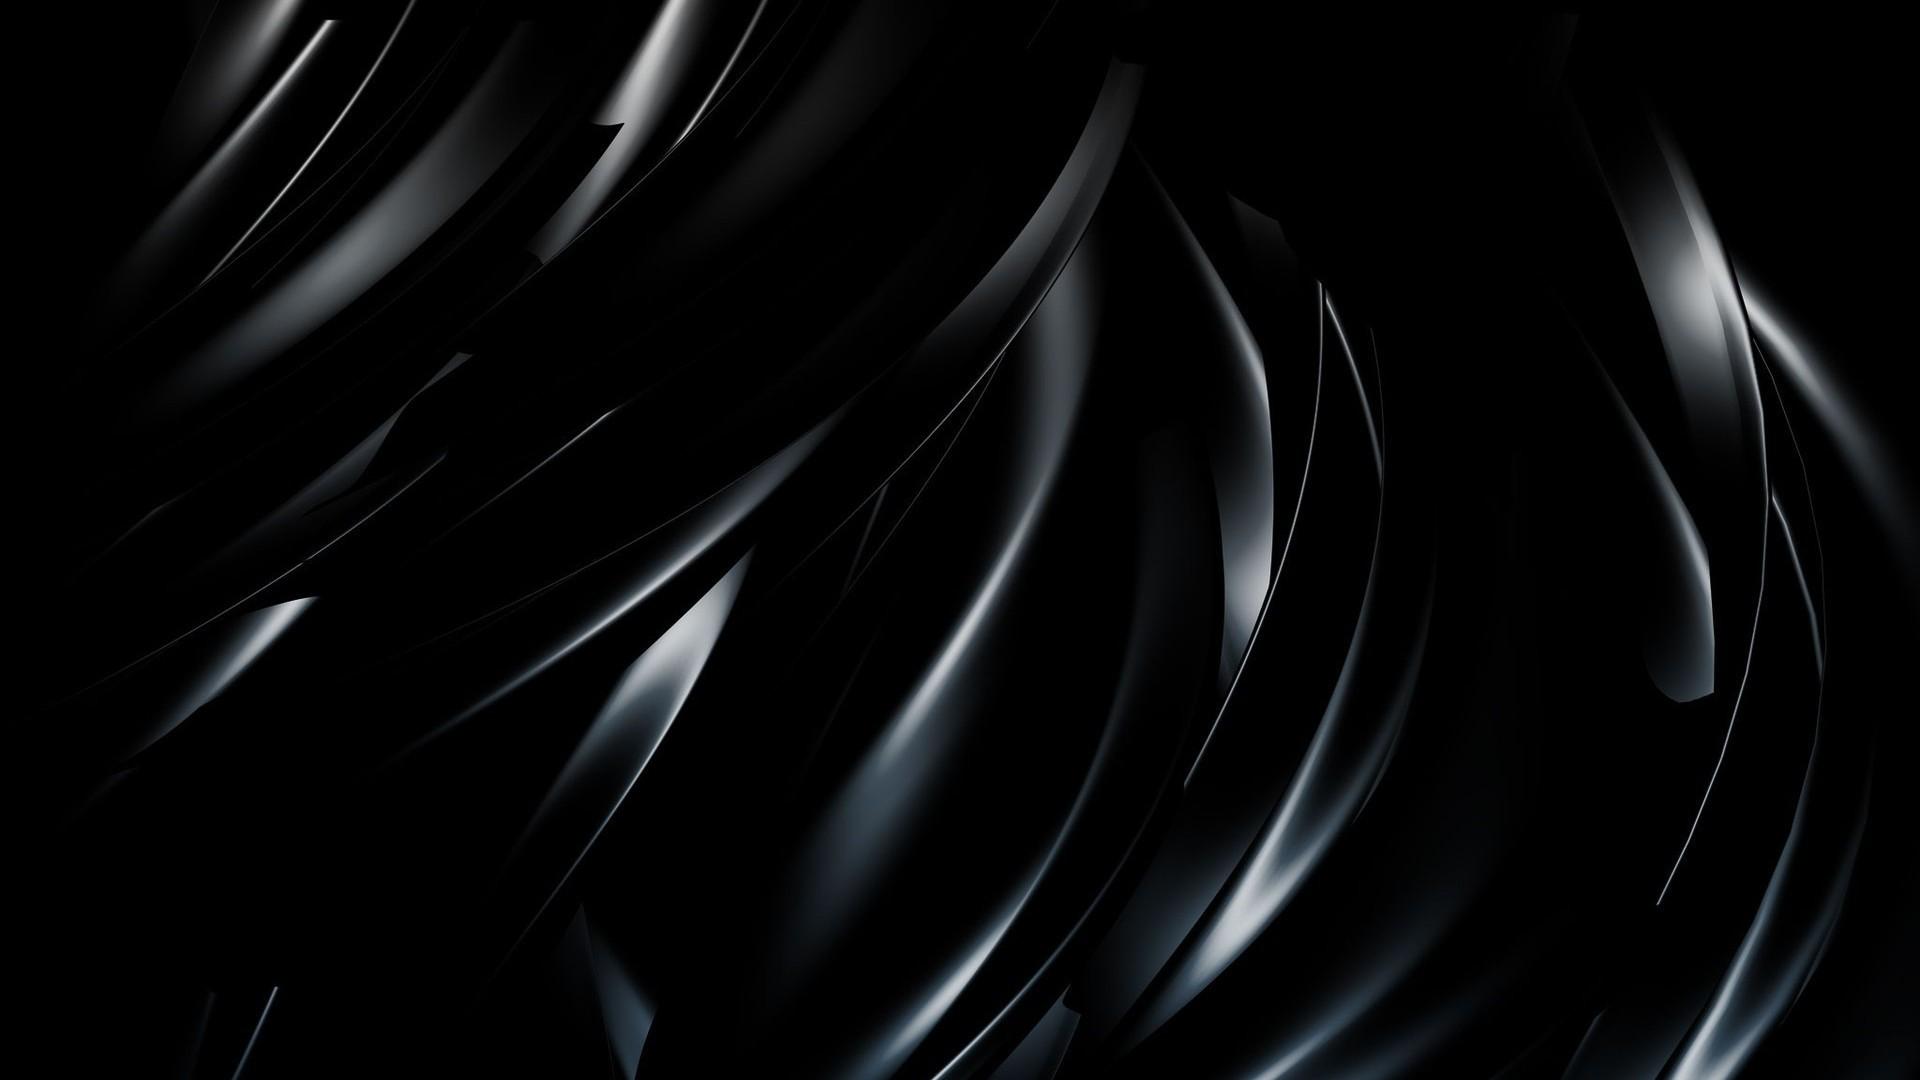 Tags: black, dark, abstract